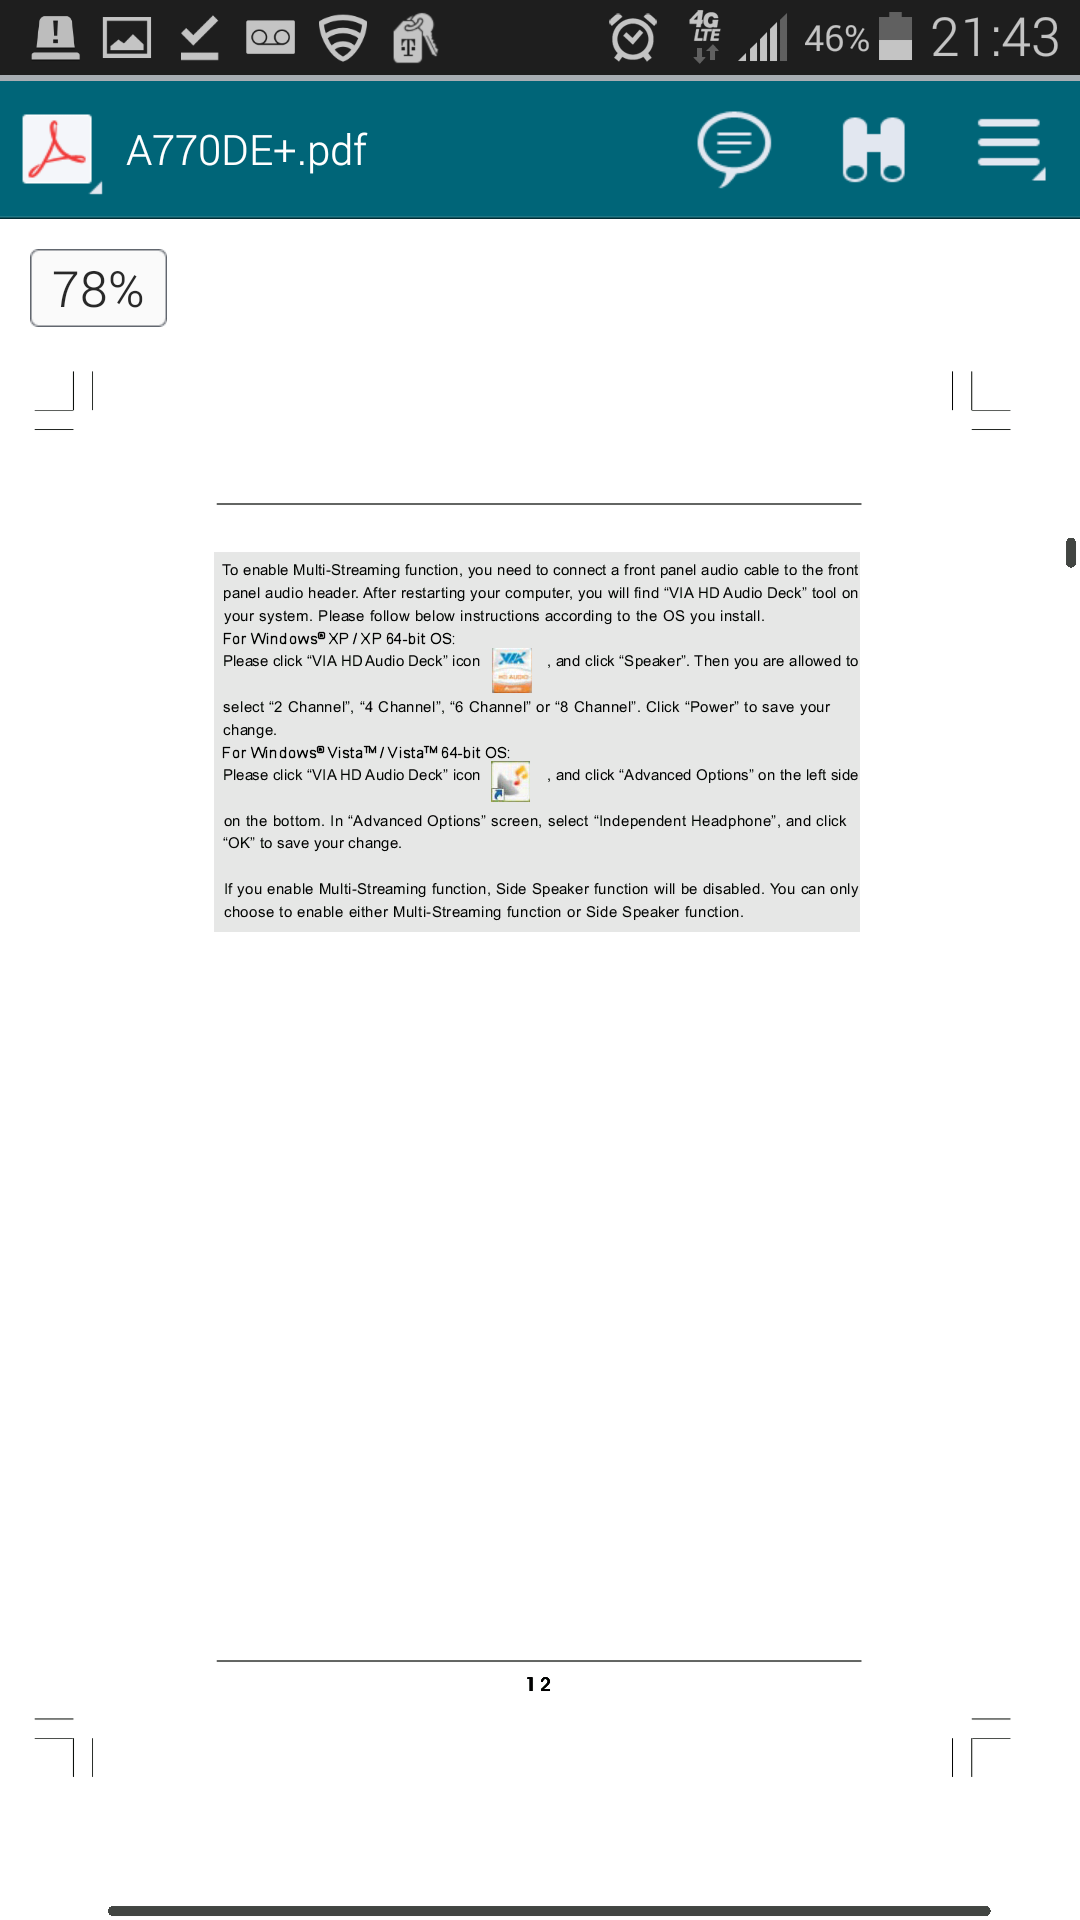 Screenshot_2018-04-16-21-43-05.png